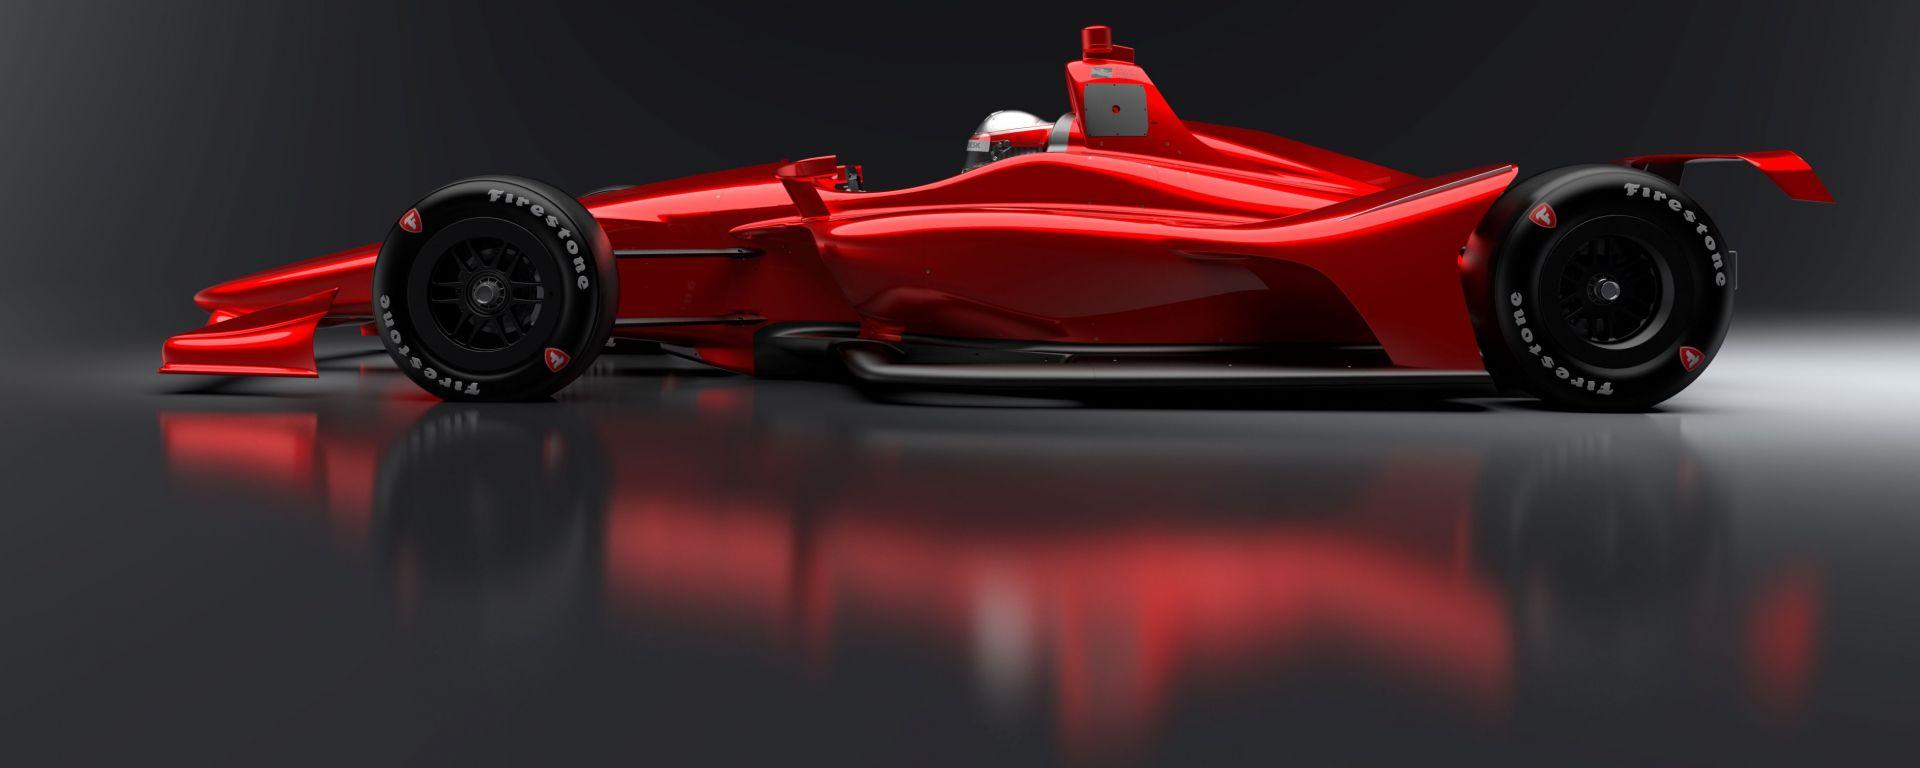 Rendering Dallara IndyCar 2018: vista laterale